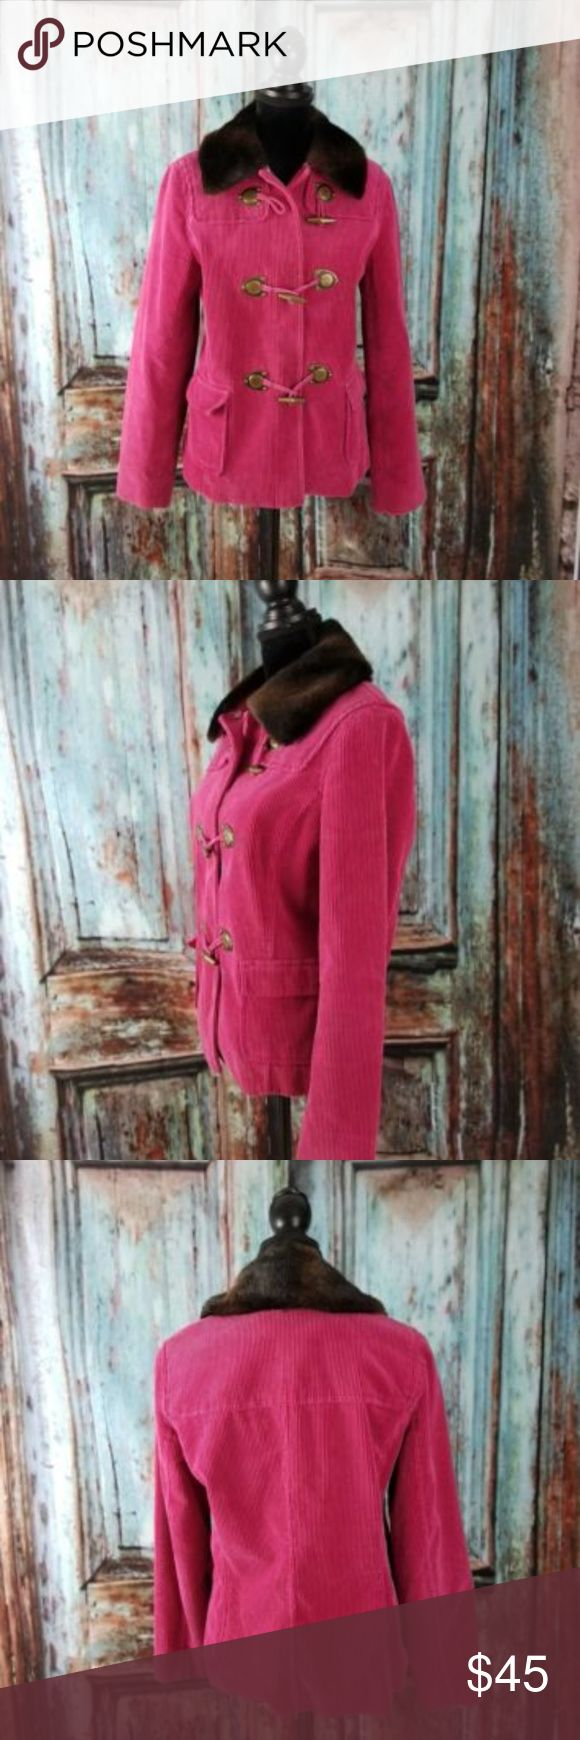 "Hot Pink Cord Pea coat detach Faux Fur Collar L Liz Claiborne Vintage Hot Pink Corduroy Jacket detachable Faux Fur Collar Sz Large Heavy and warm!   Bust 19.5"" Length from collar to hem 23.5"" Sleeve length 25"" Inseam 16"" Liz Claiborne Jackets & Coats Pea Coats"